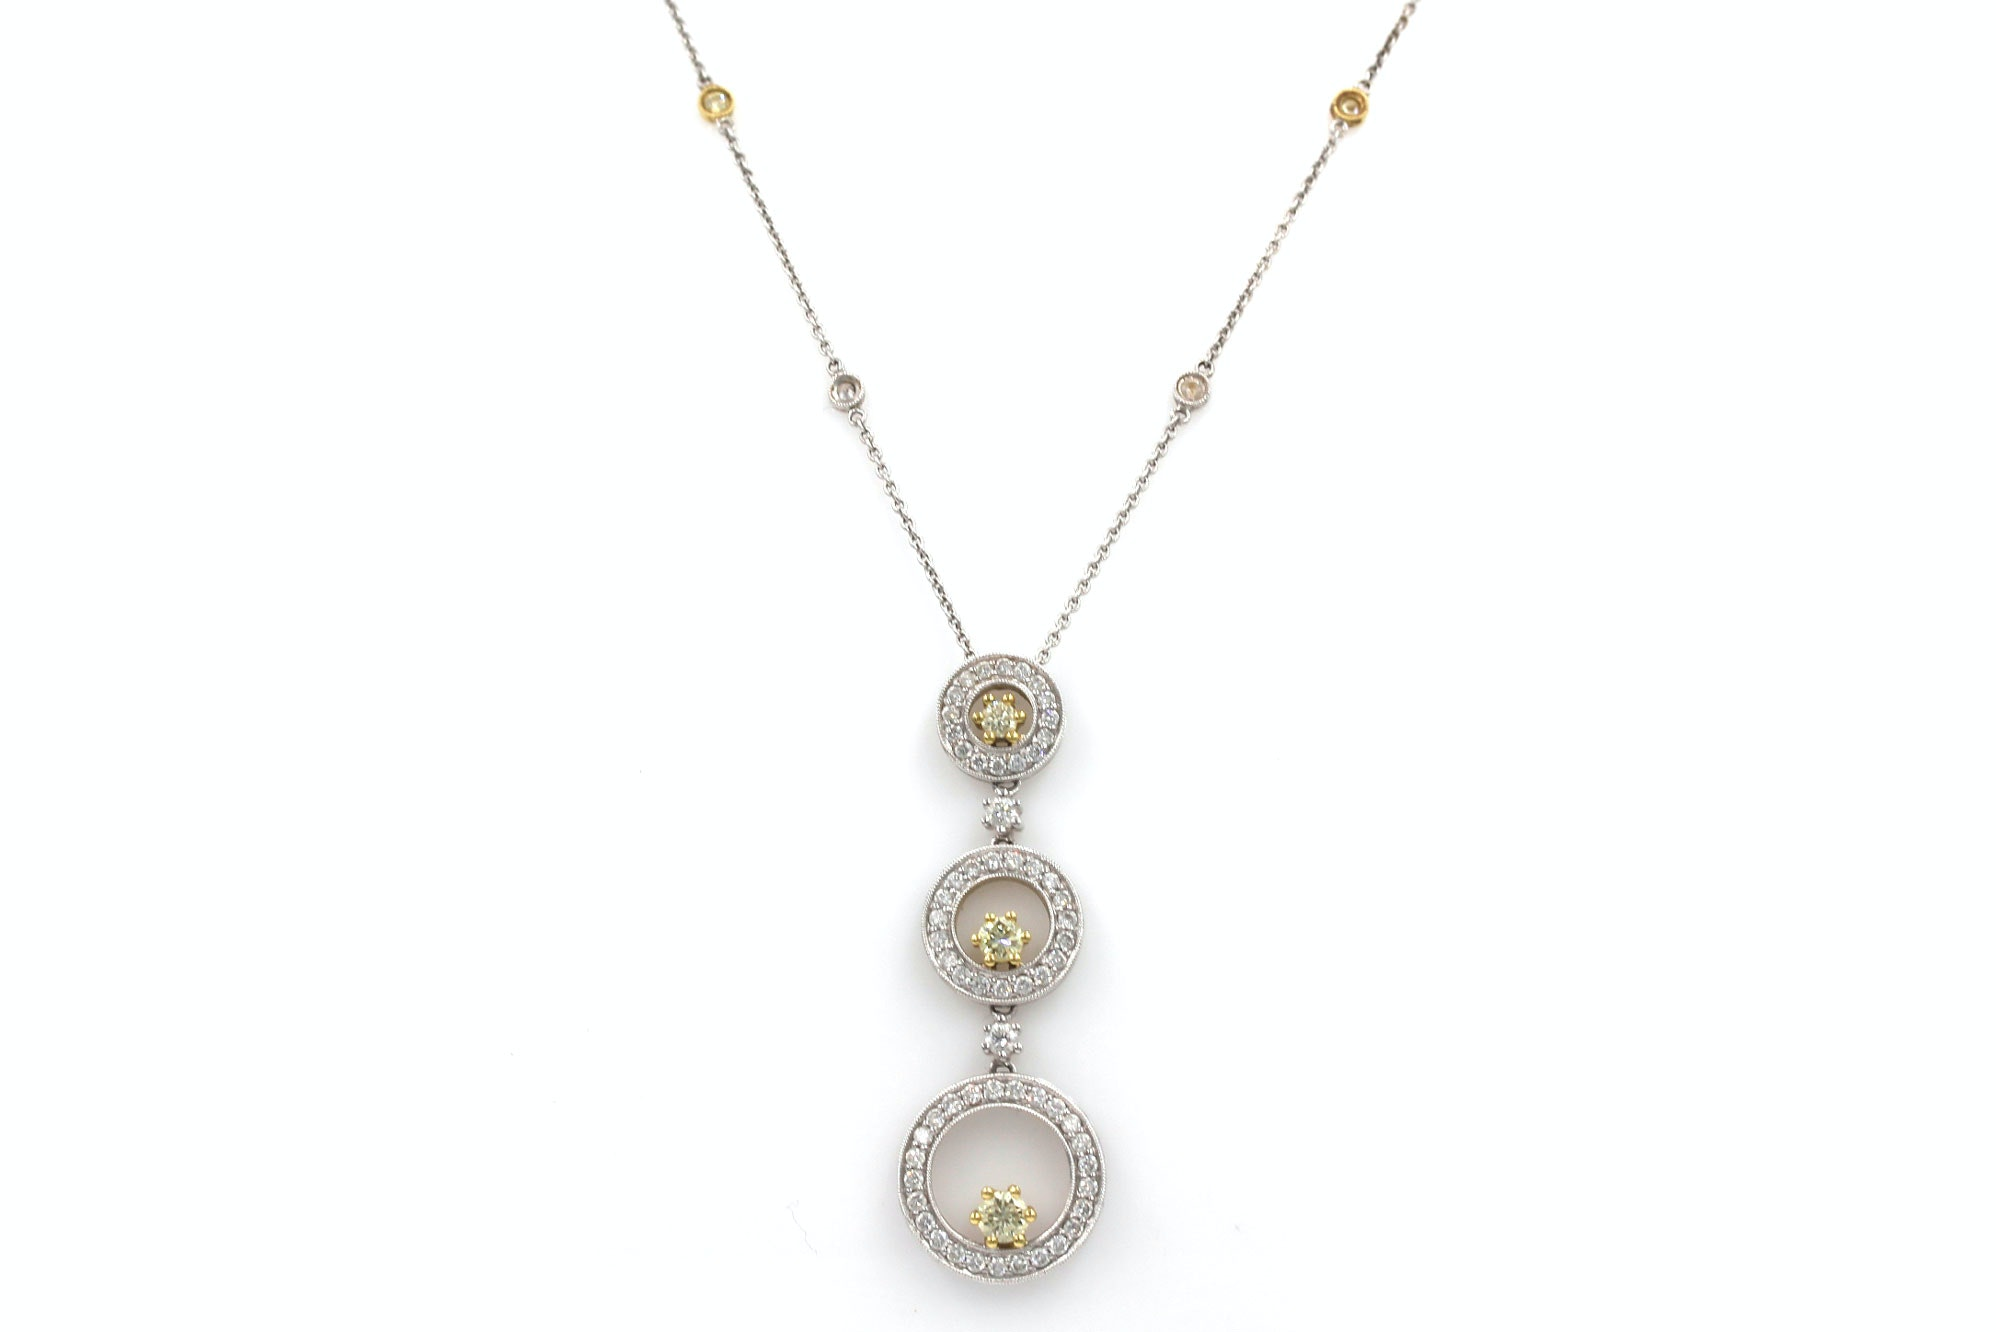 Simon G. 18K Two-Tone Gold 1.15 CTW Diamond Pendant Necklace